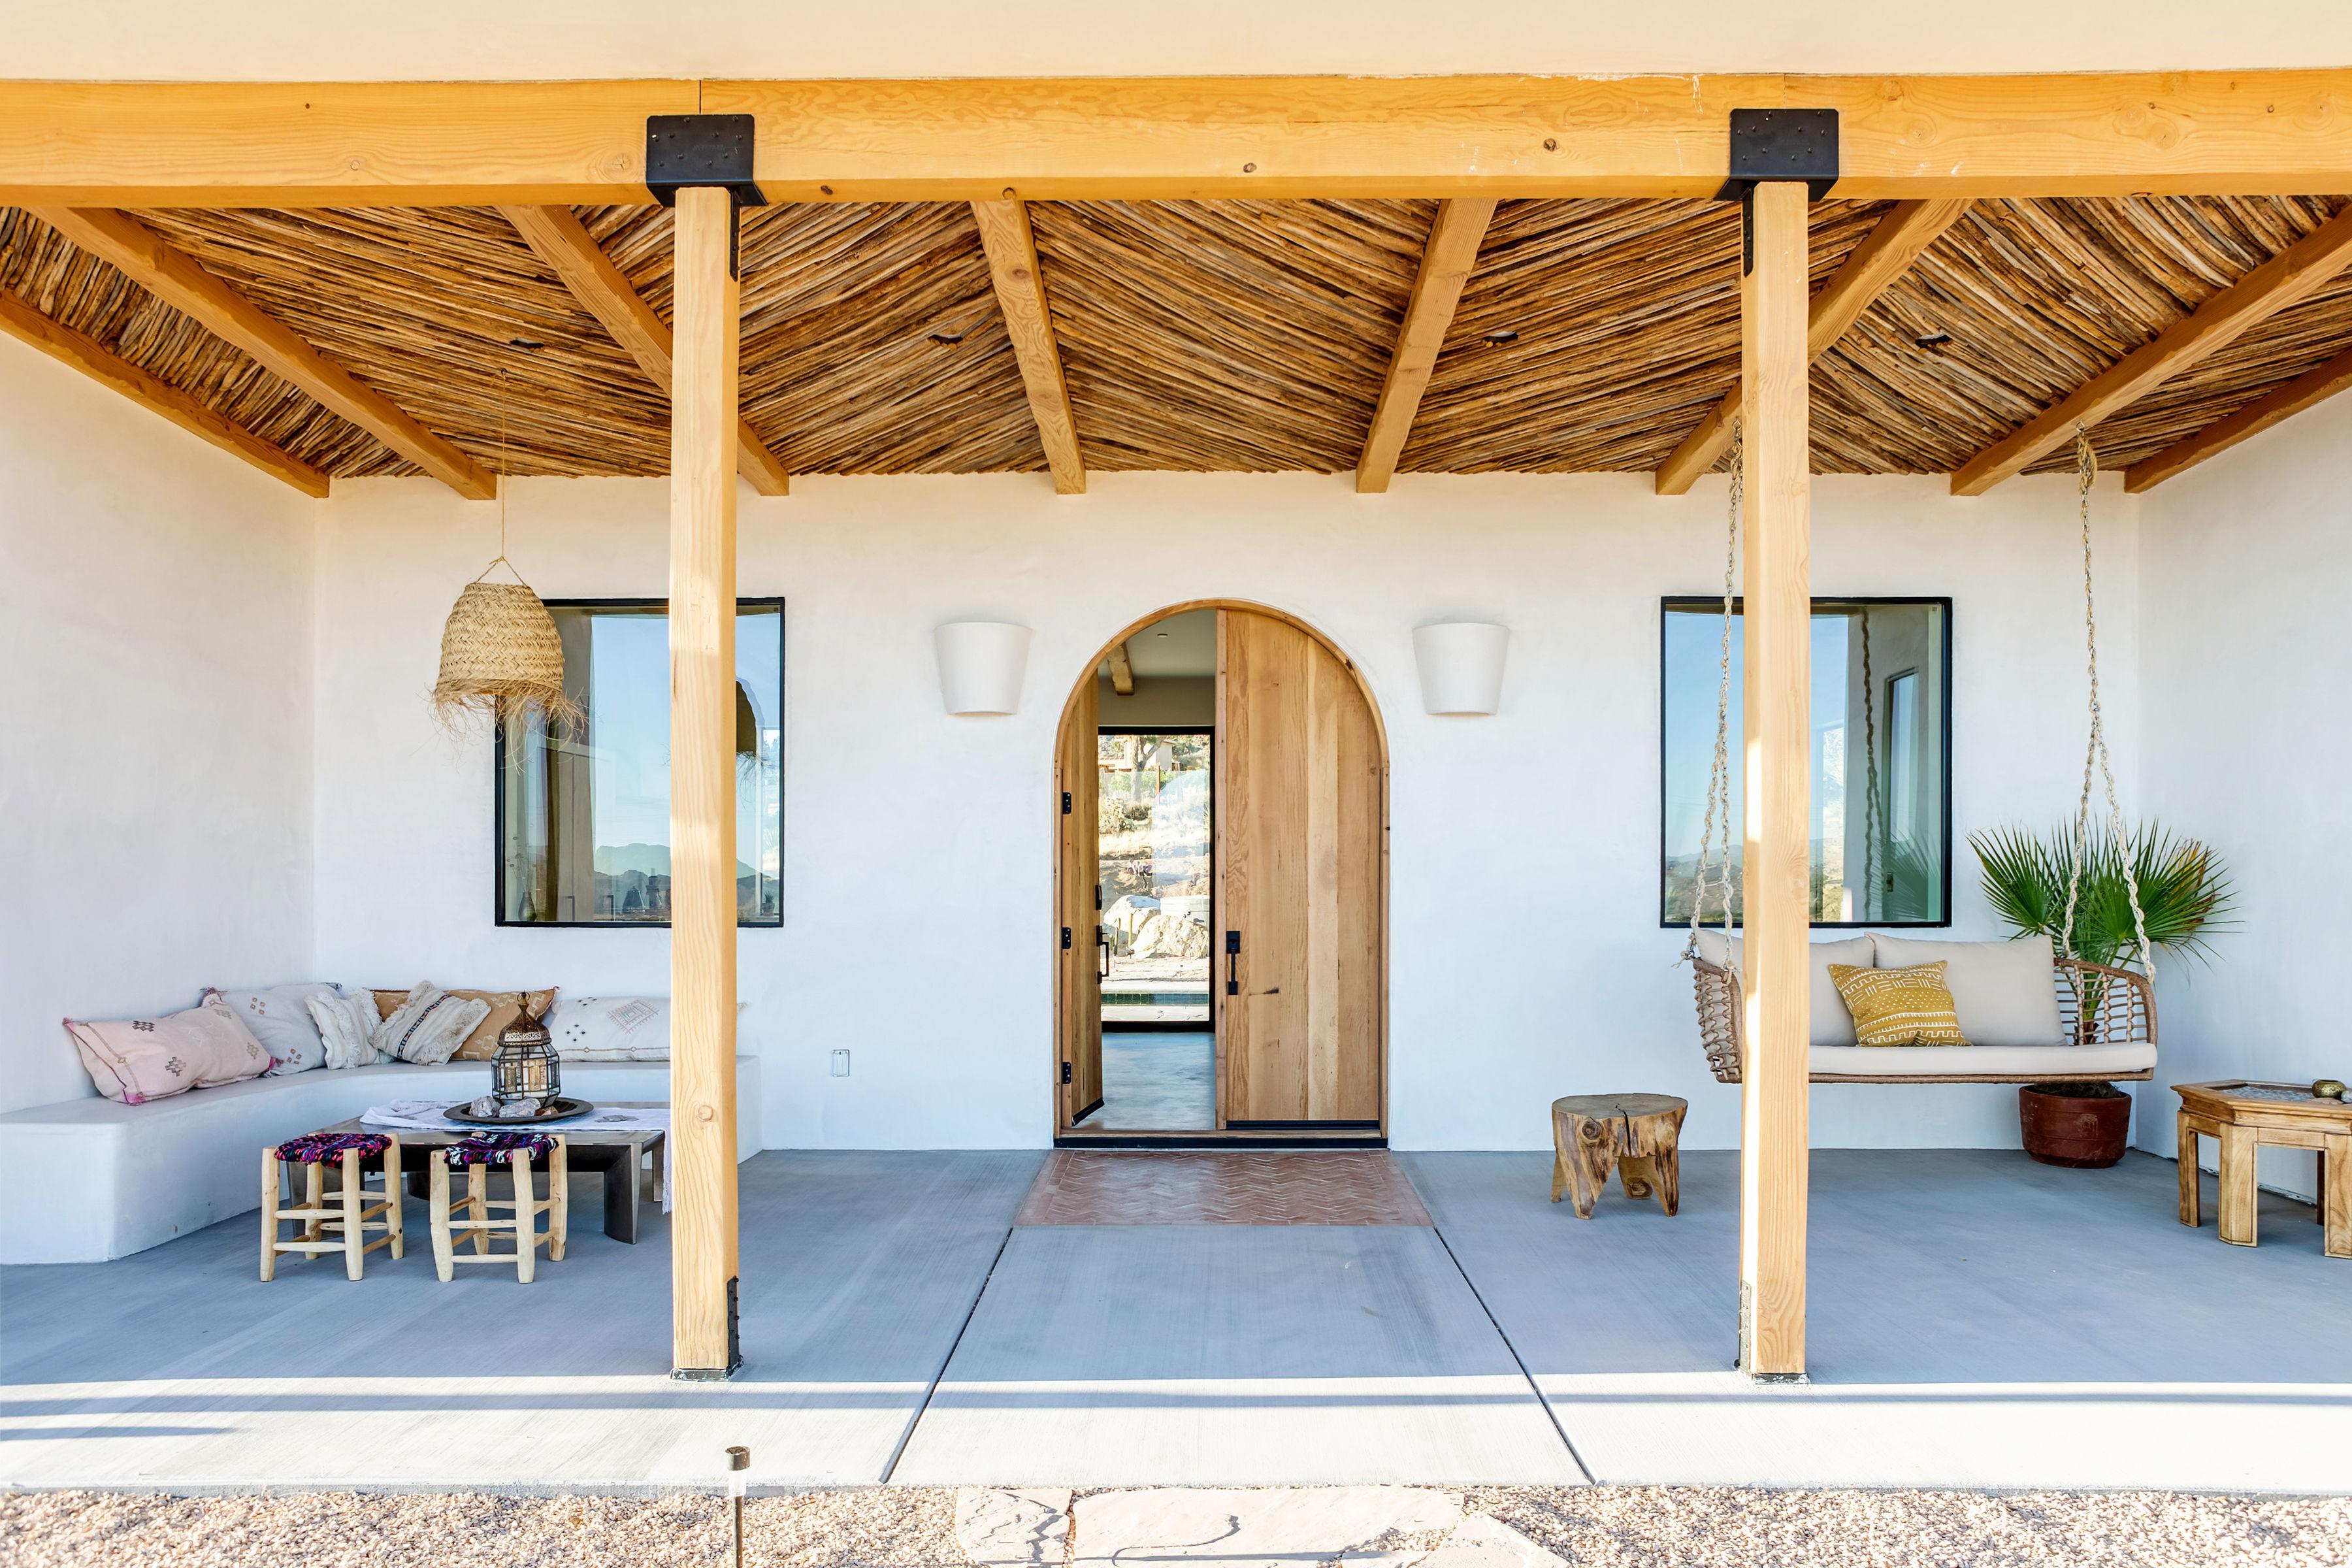 2-porch-desert-wild-joshua-tree-home-pr-1019.jpg